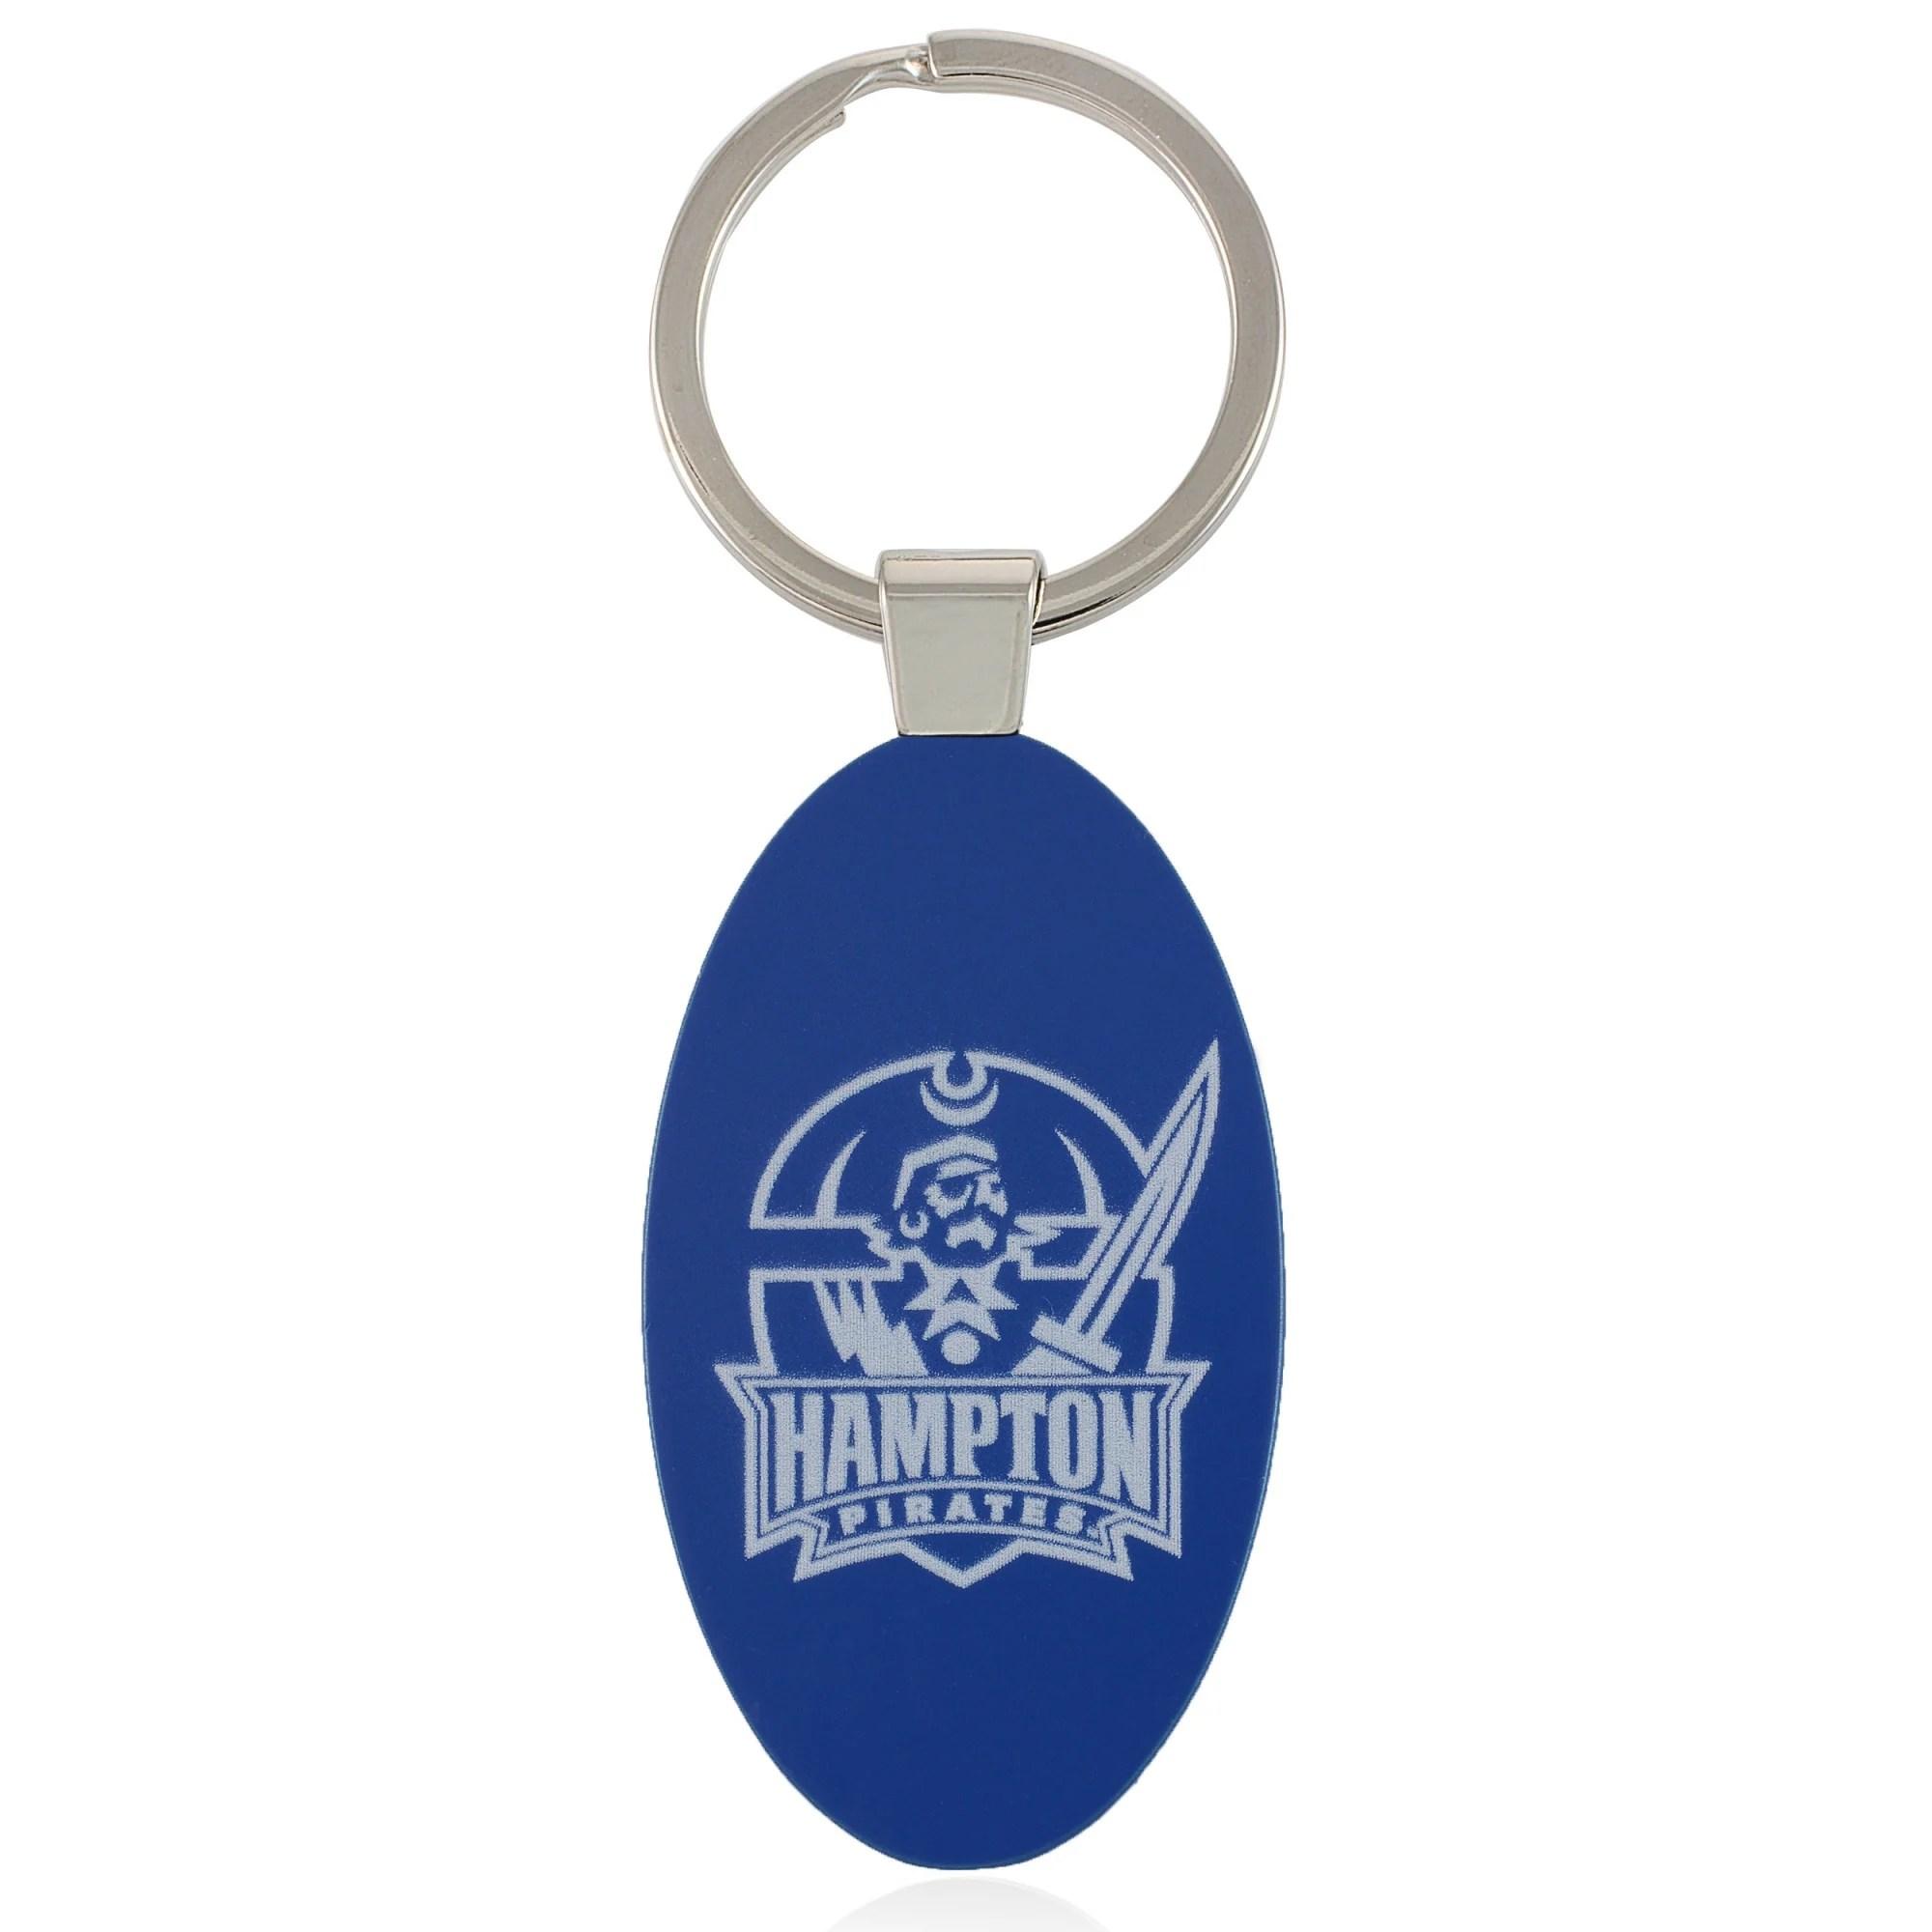 hampton university pirates key